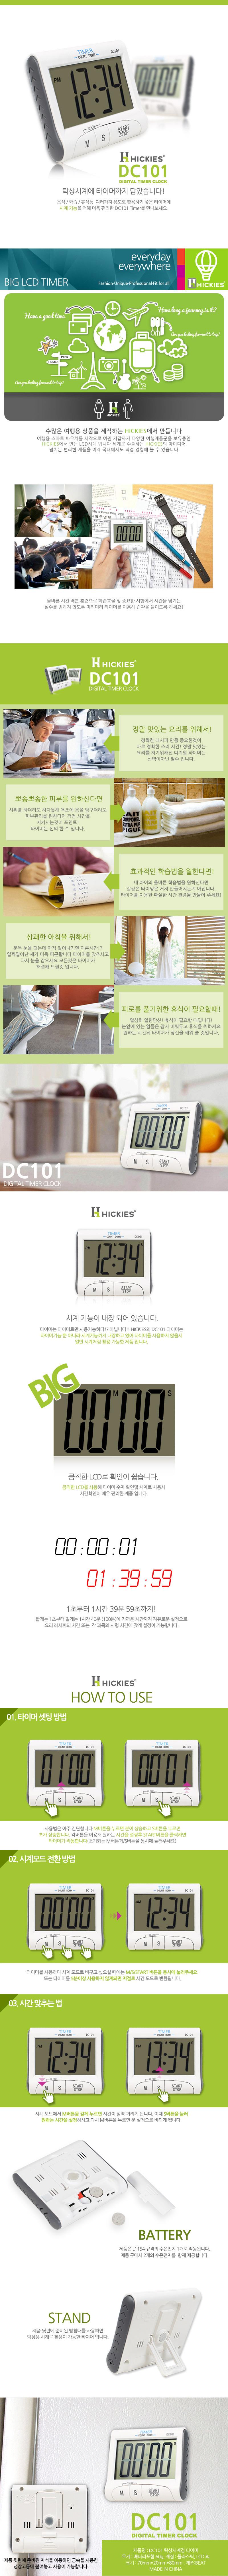 HICKIES 시계기능 타이머 BIG LCD TIMER - 히키스, 9,900원, 알람/탁상시계, LED/디지털시계